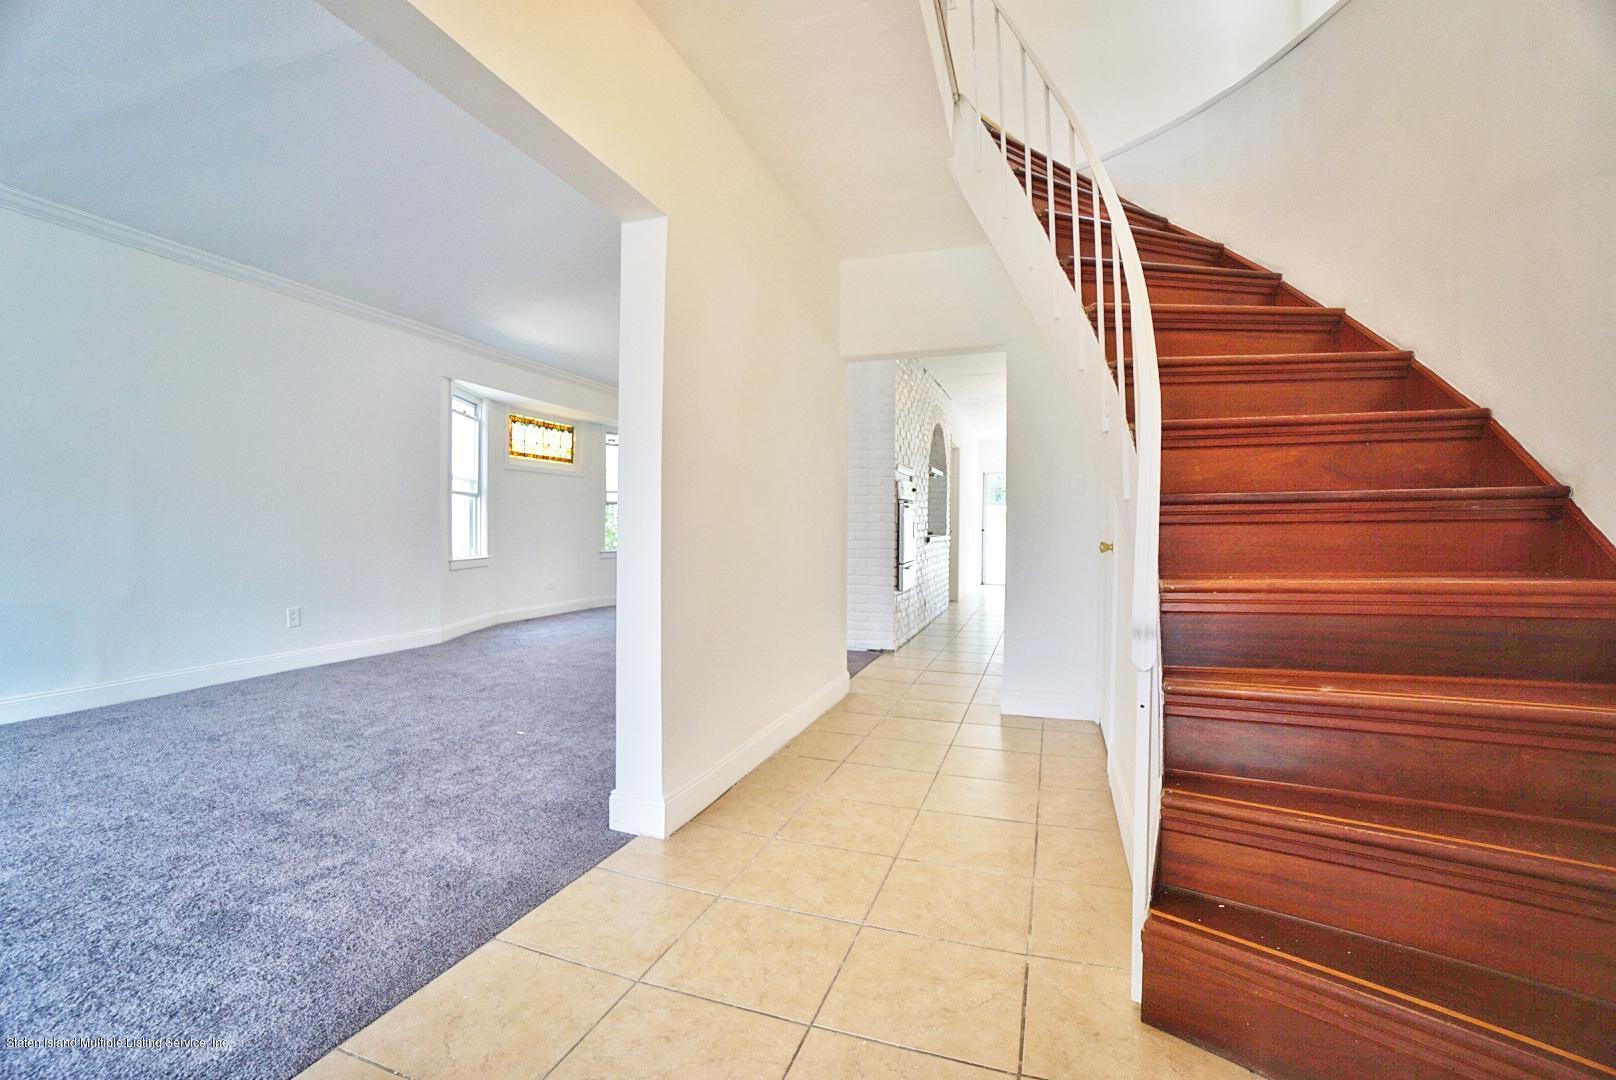 Single Family - Detached 53 Dubois Avenue  Staten Island, NY 10310, MLS-1128749-8